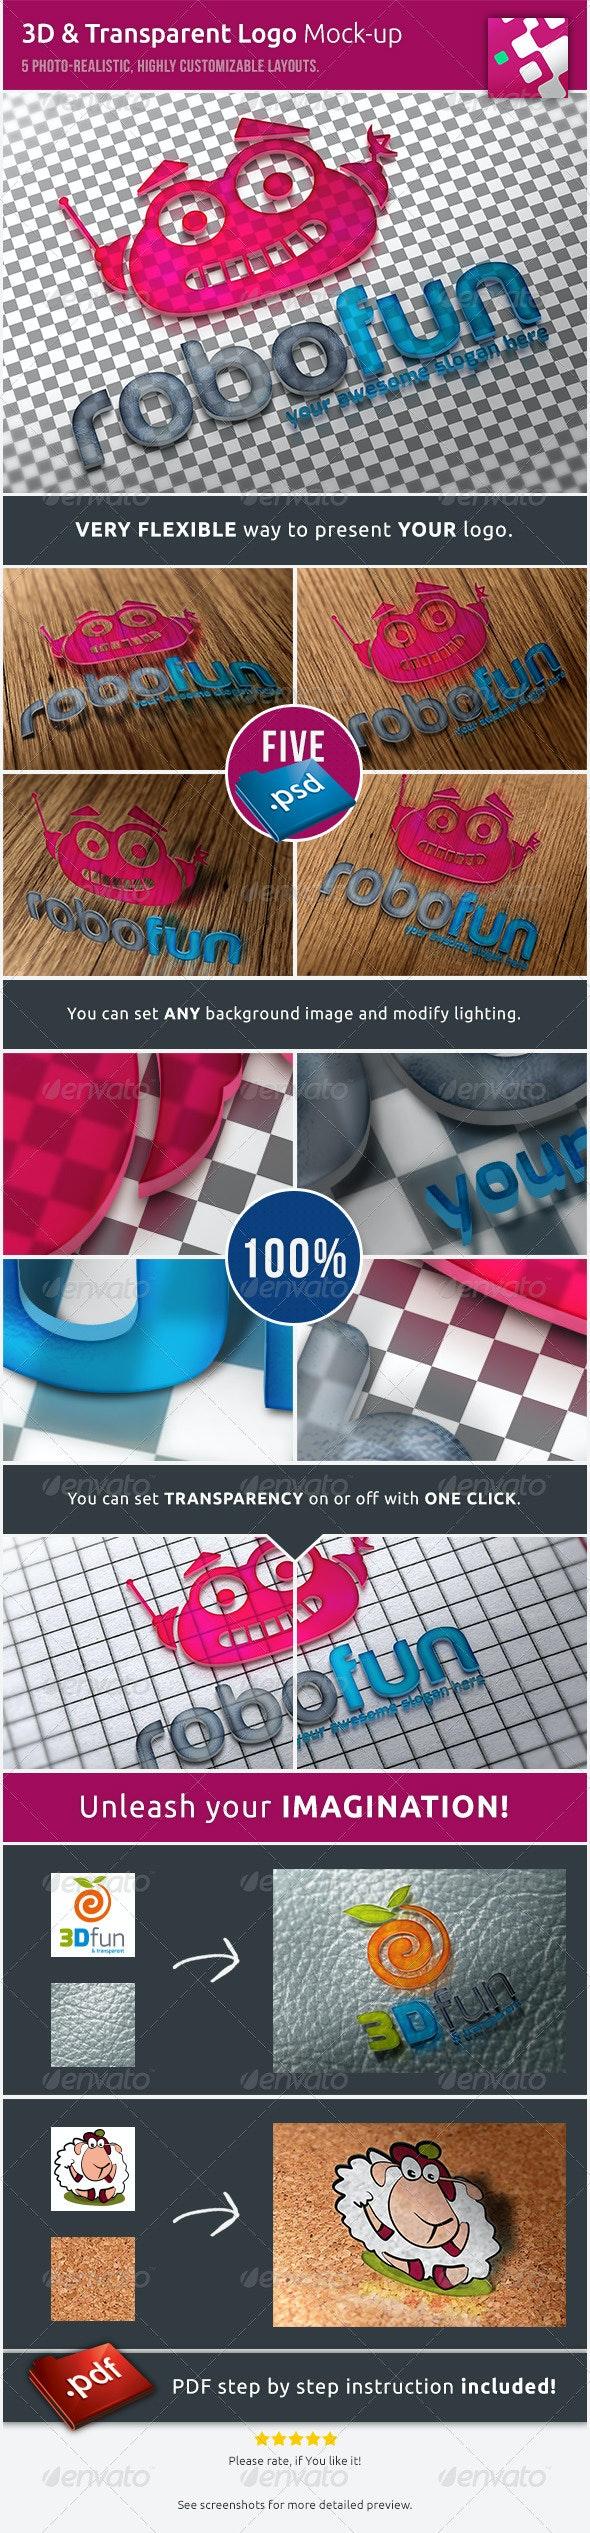 3D & Transparent Logo Mockups - Miscellaneous Product Mock-Ups